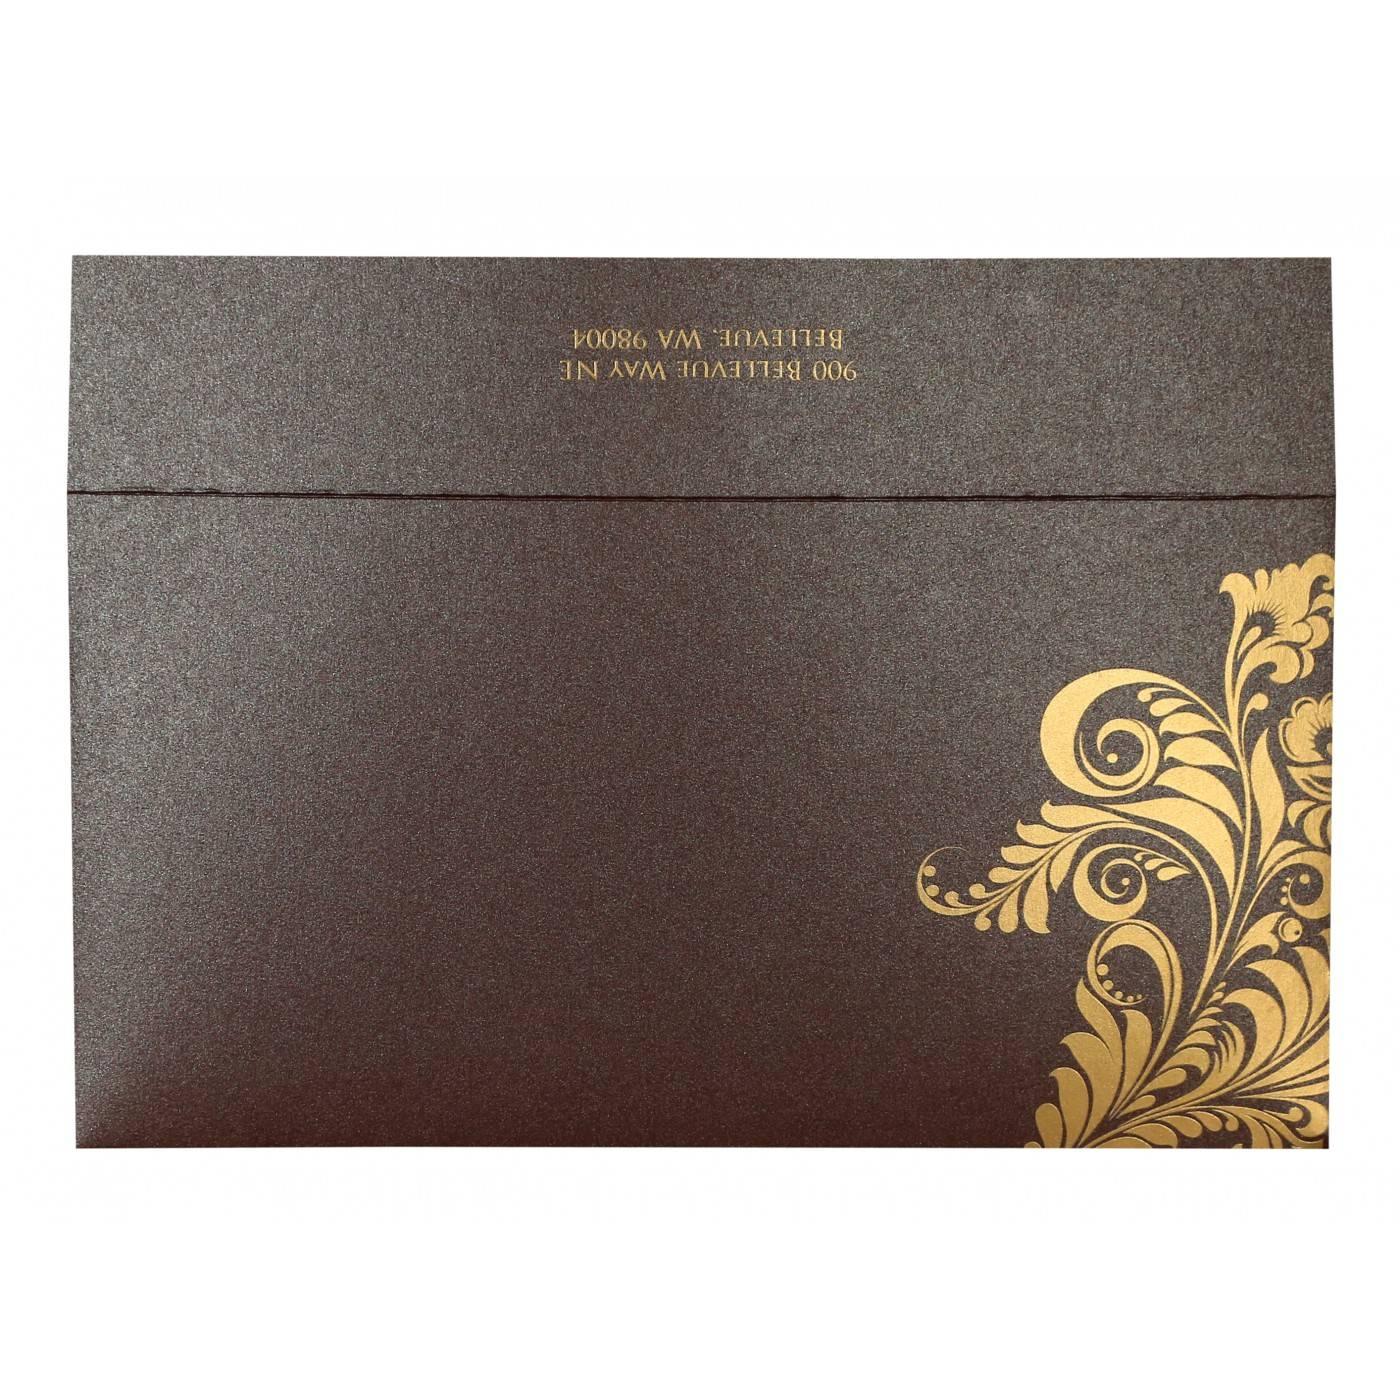 PURPLE SHIMMERY FLORAL THEMED - SCREEN PRINTED WEDDING CARD : CIN-8259F - IndianWeddingCards